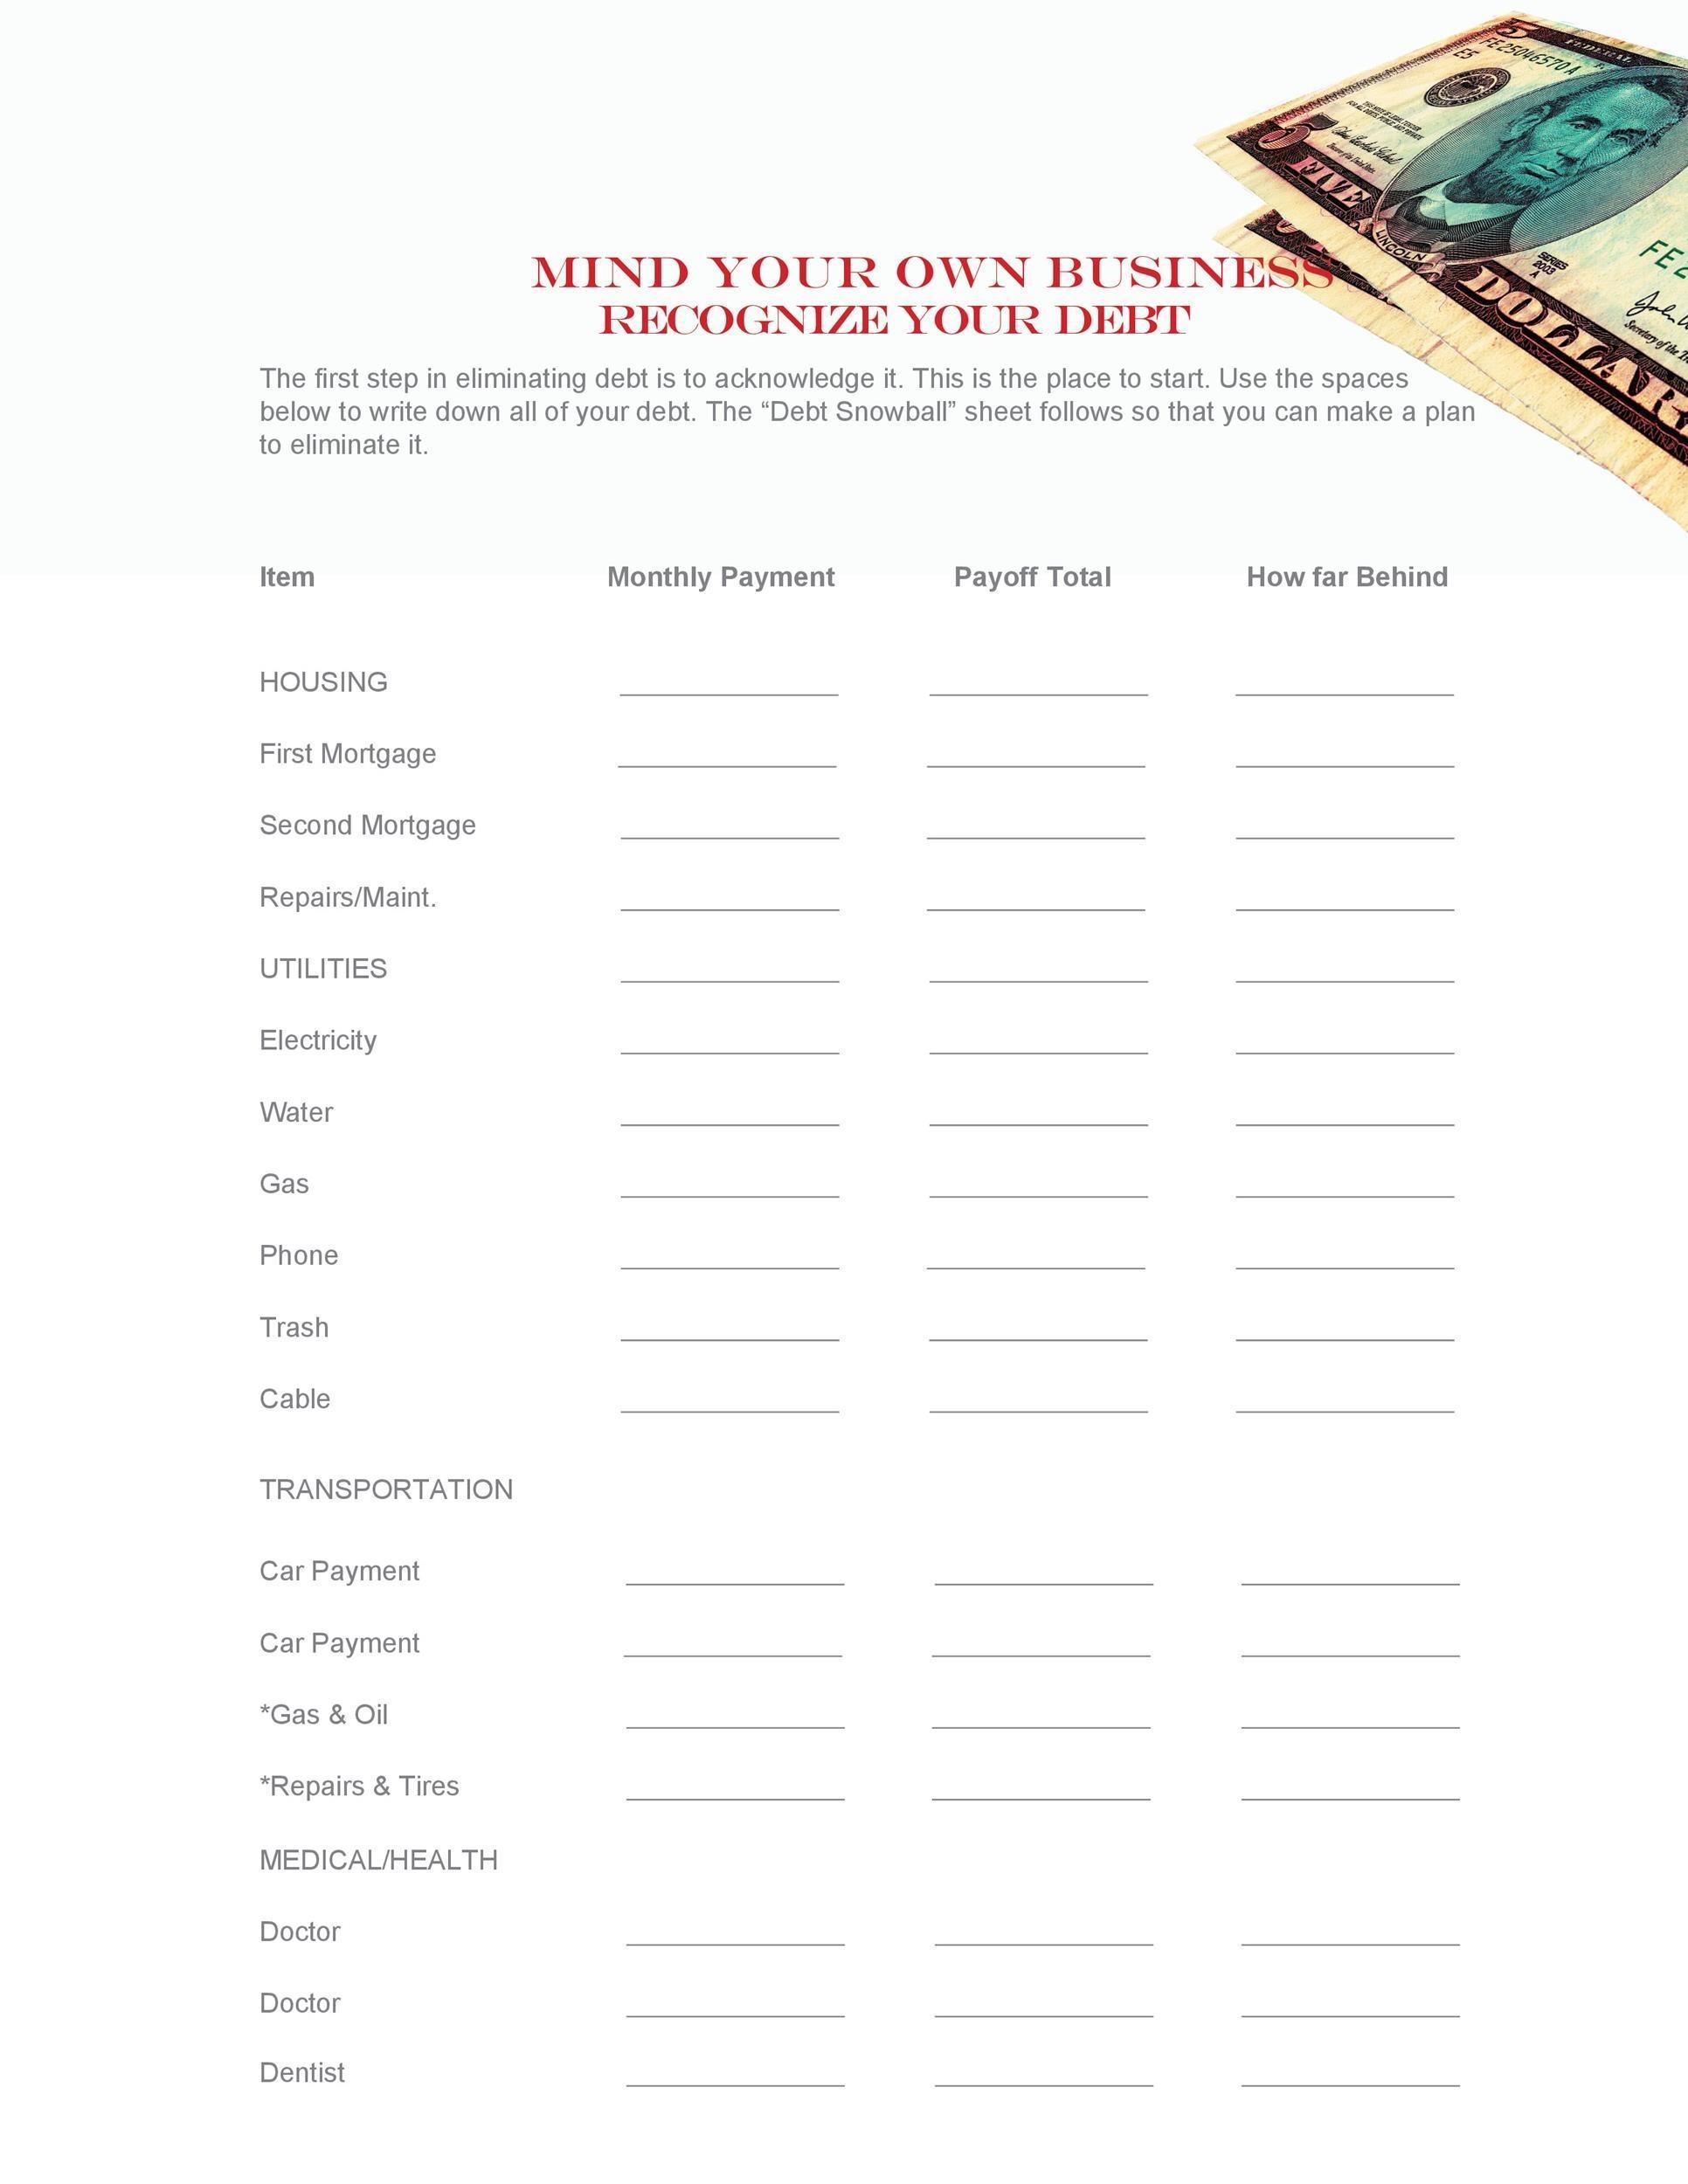 Free debt snowball spreadsheet 27